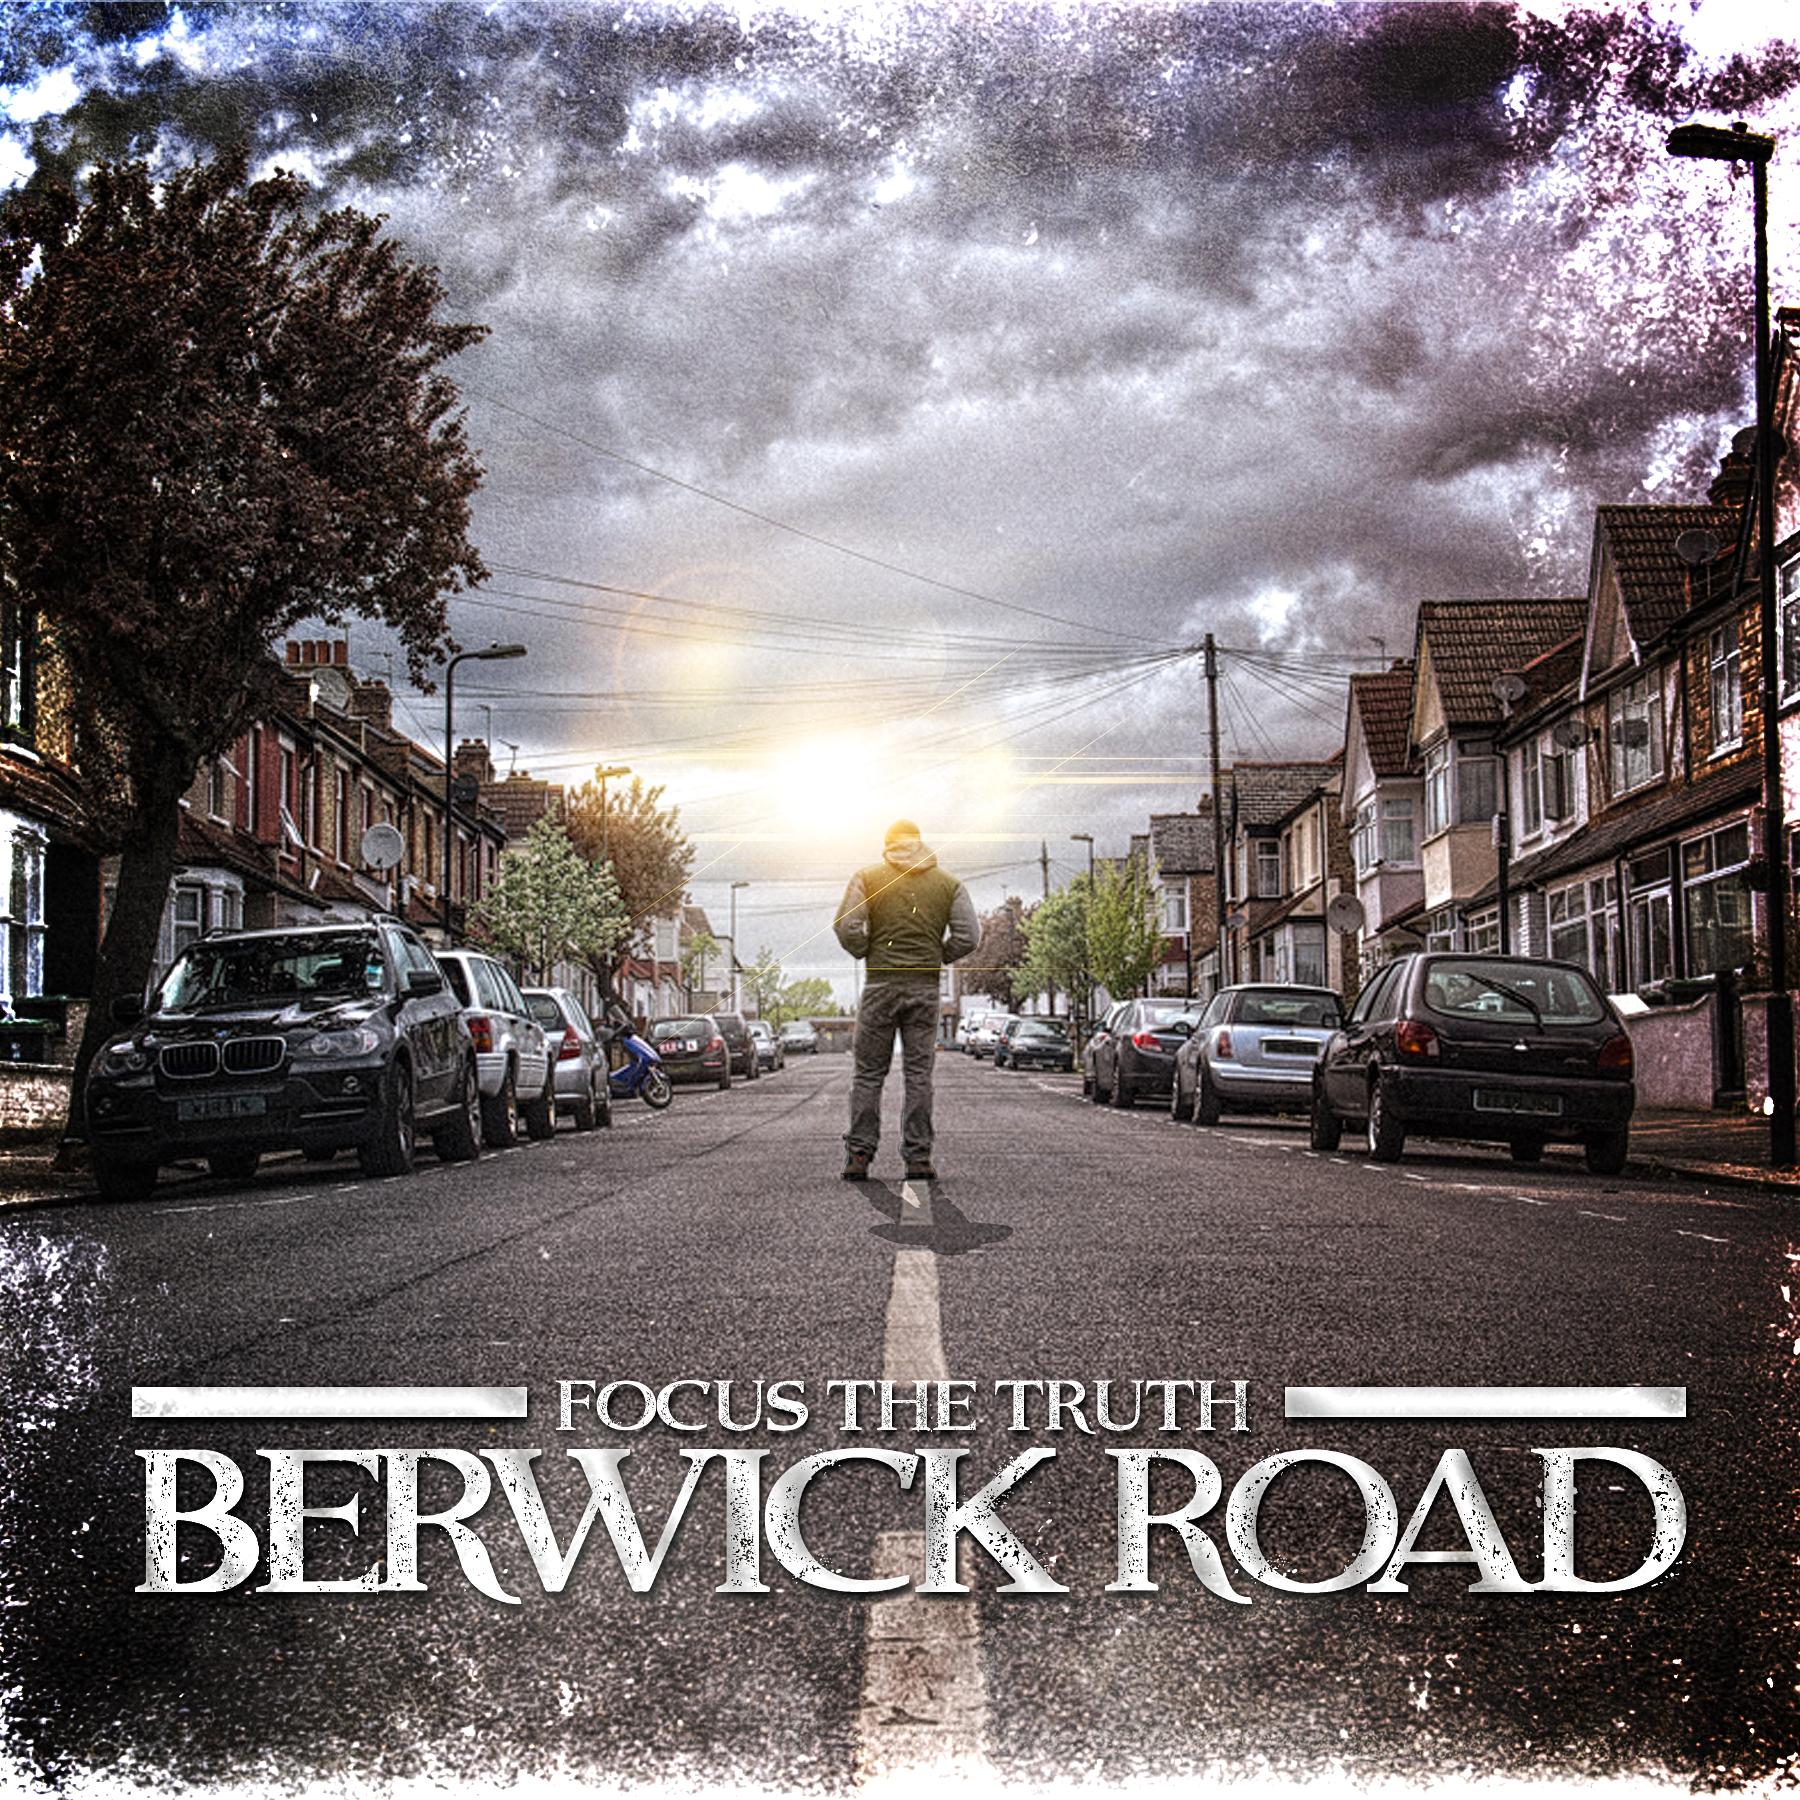 BERWICK ROAD BY FOCUS THE TRUTH - ALBUM: BERWICK ROAD